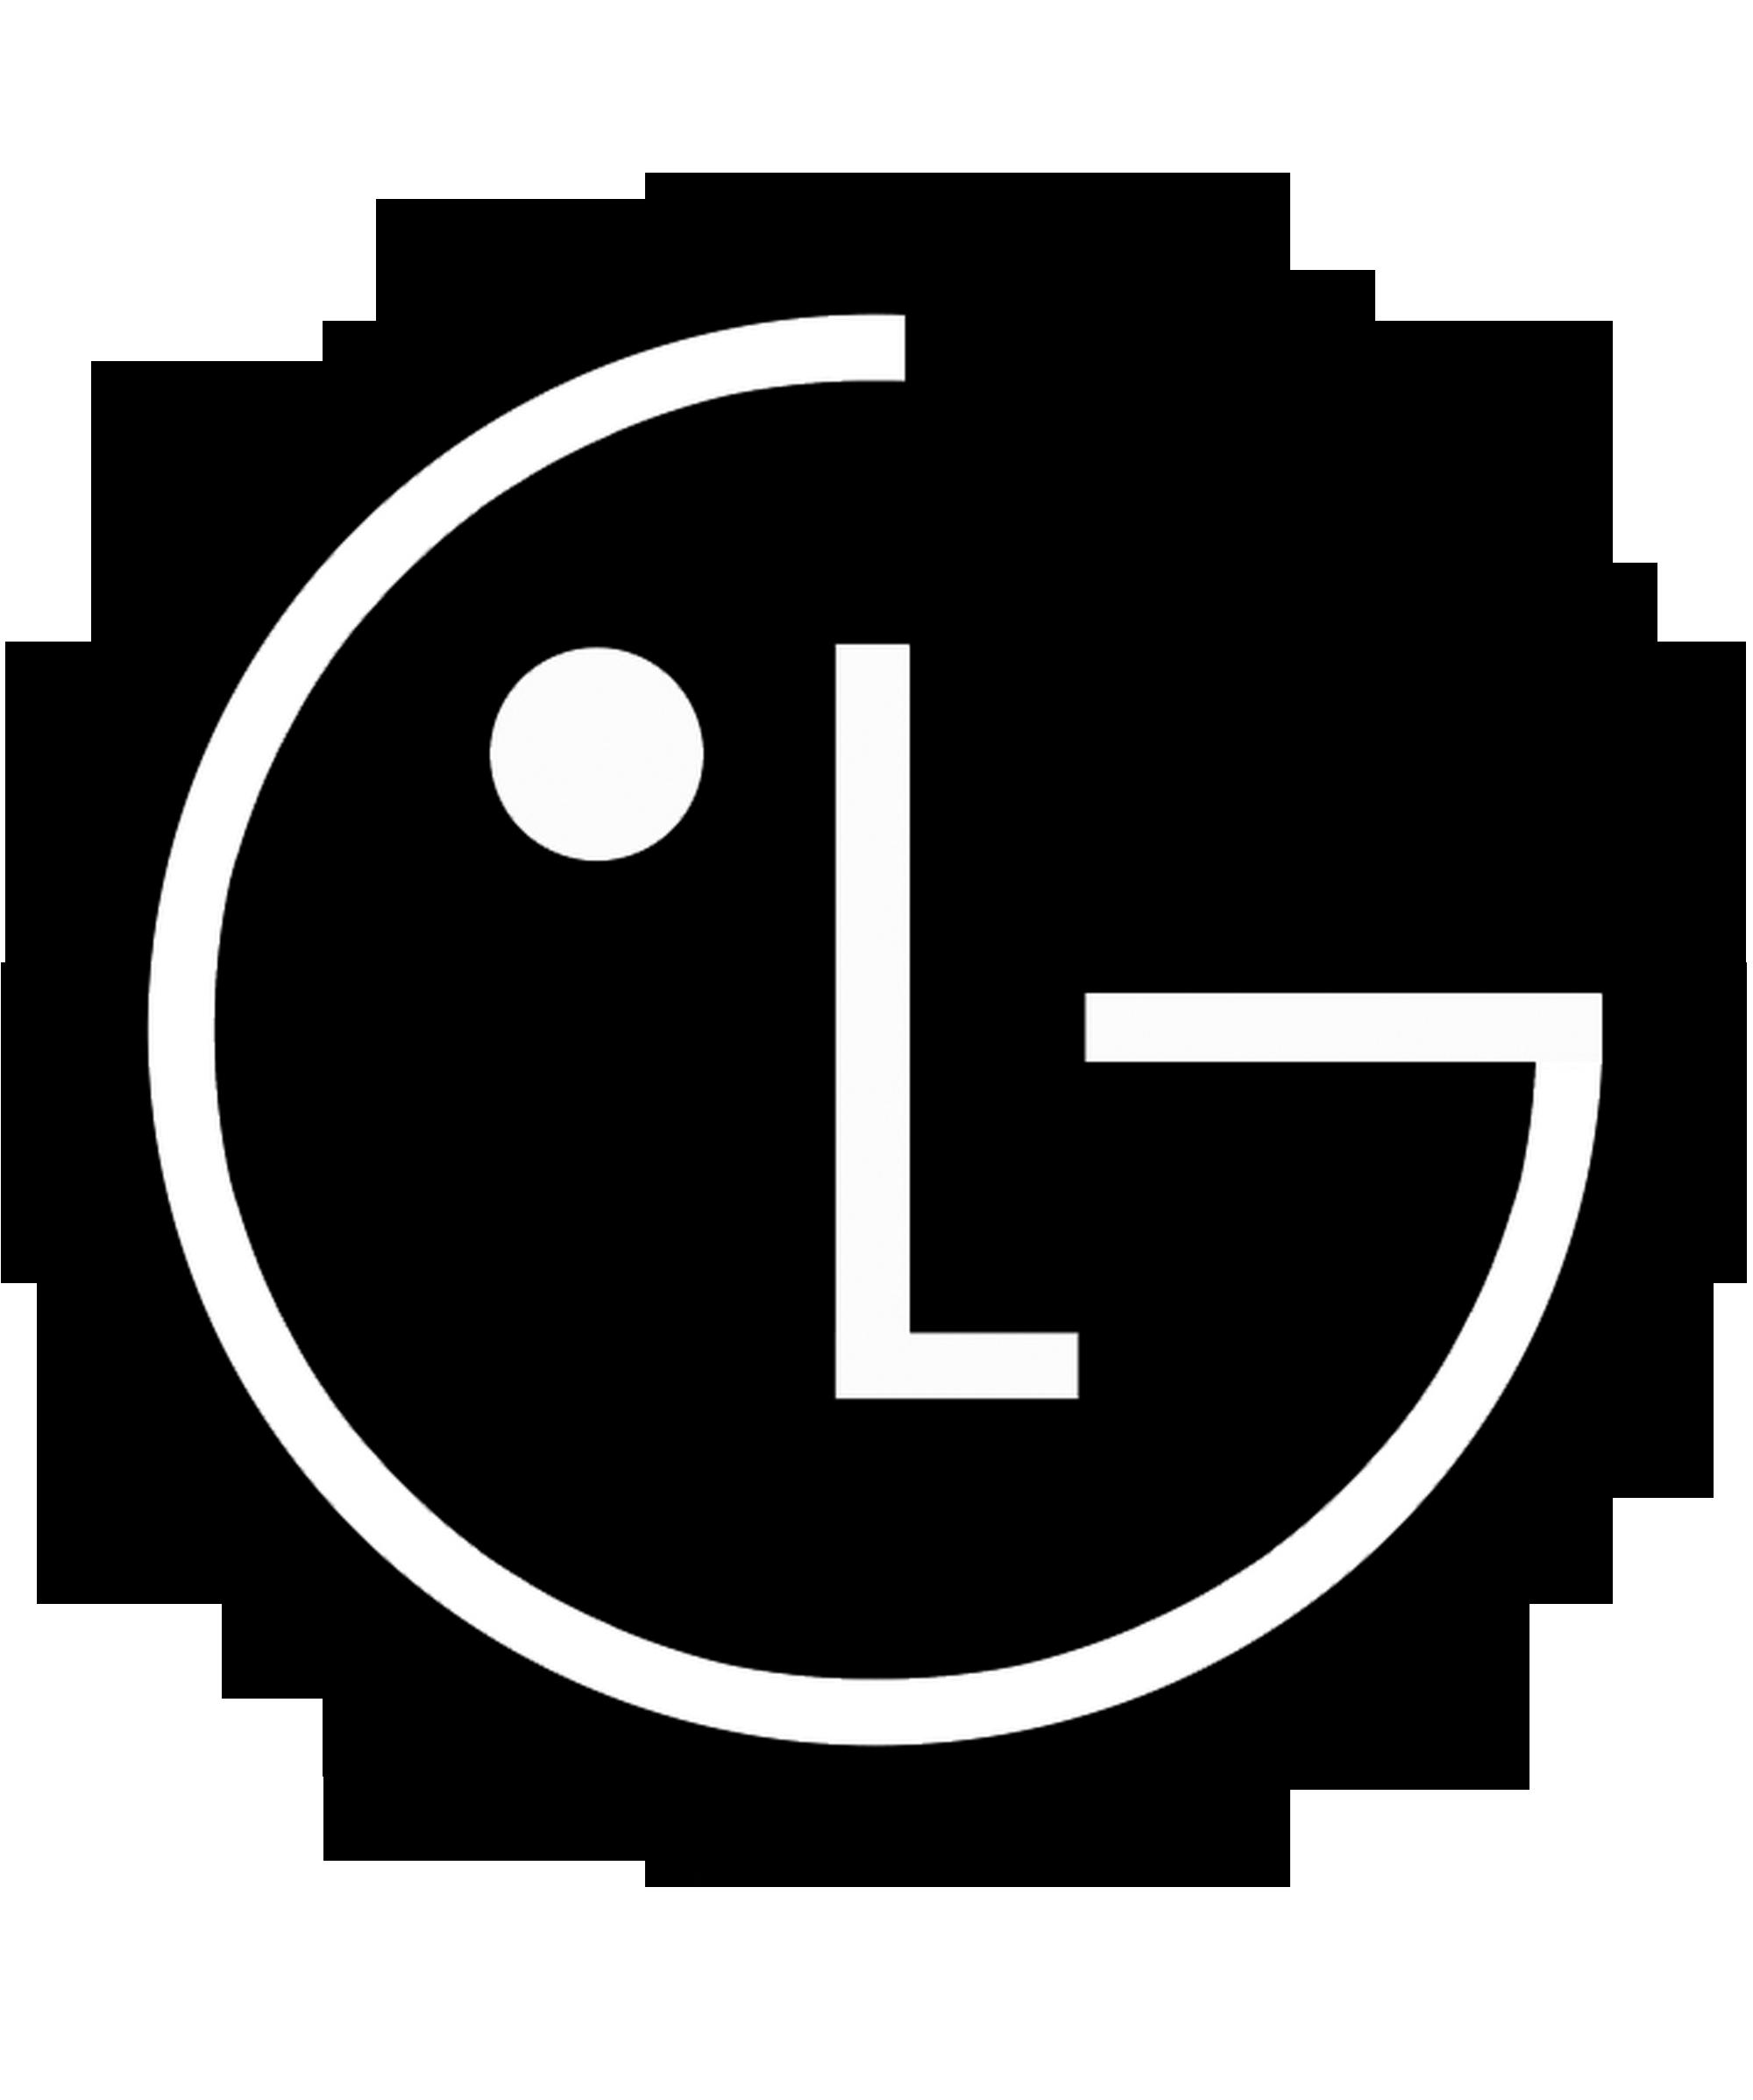 LG логотип PNG